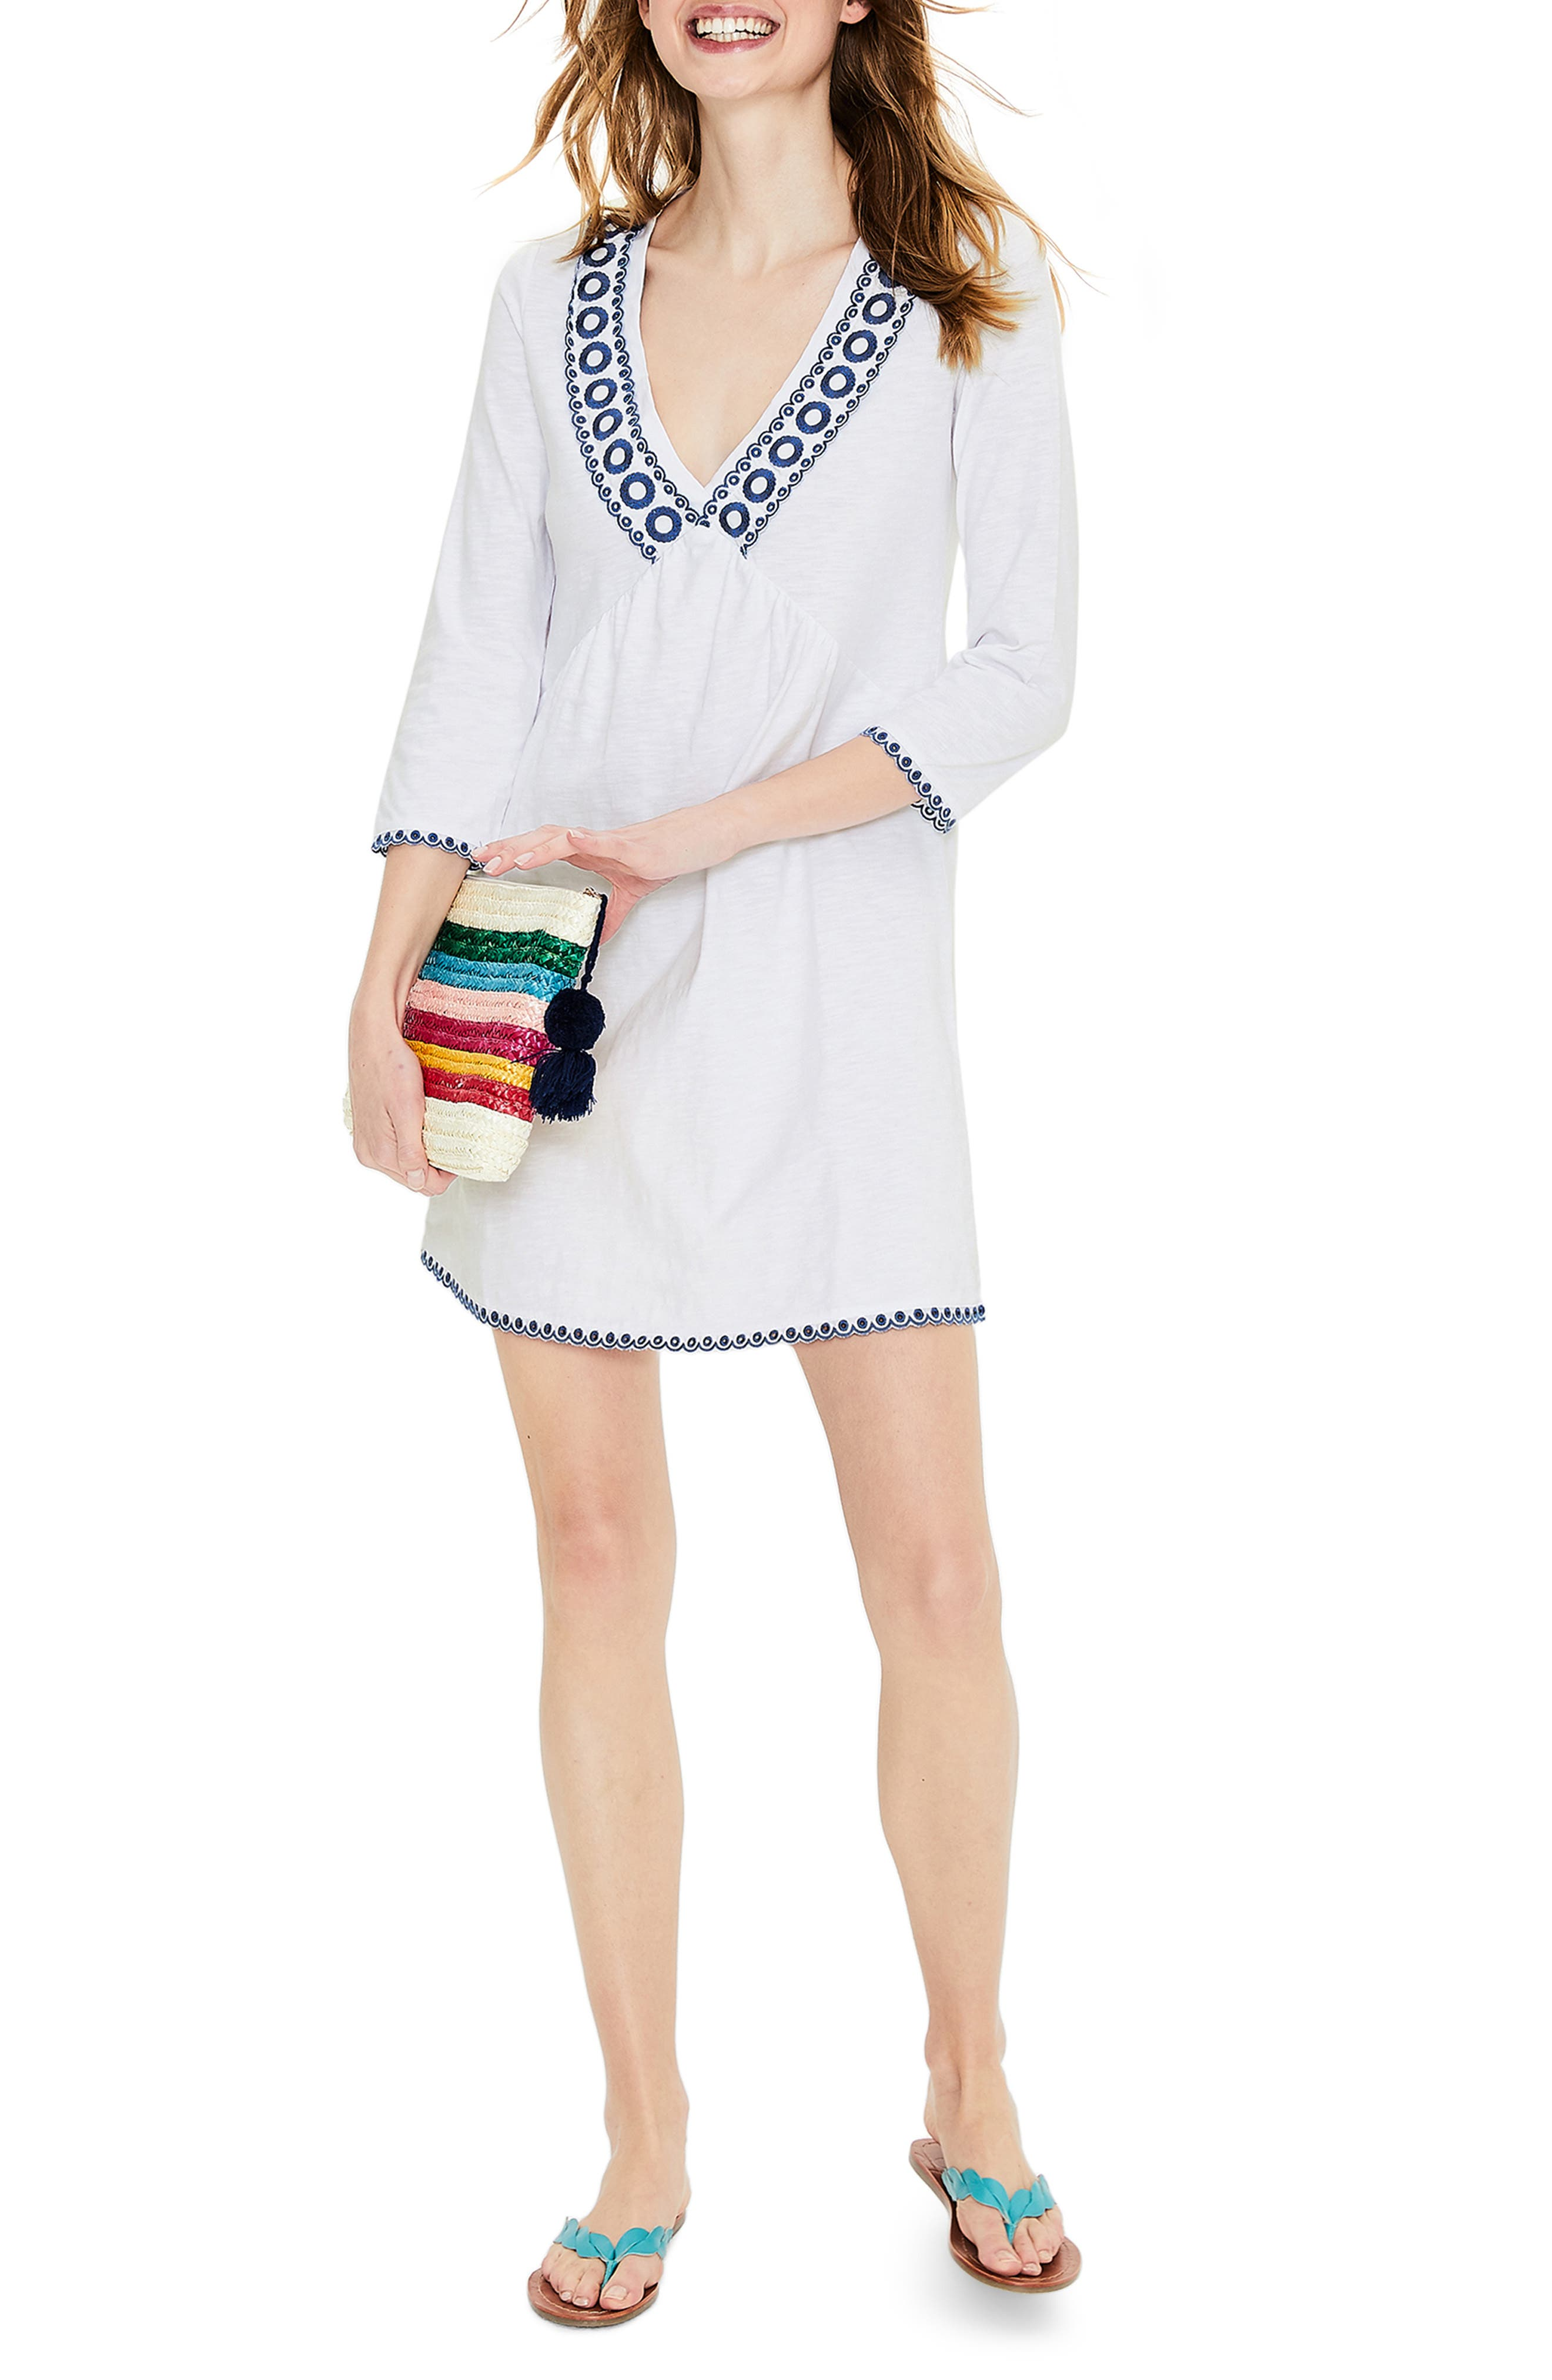 Boden Rosanna Jersey Tunic, (similar to 1-16W) - White